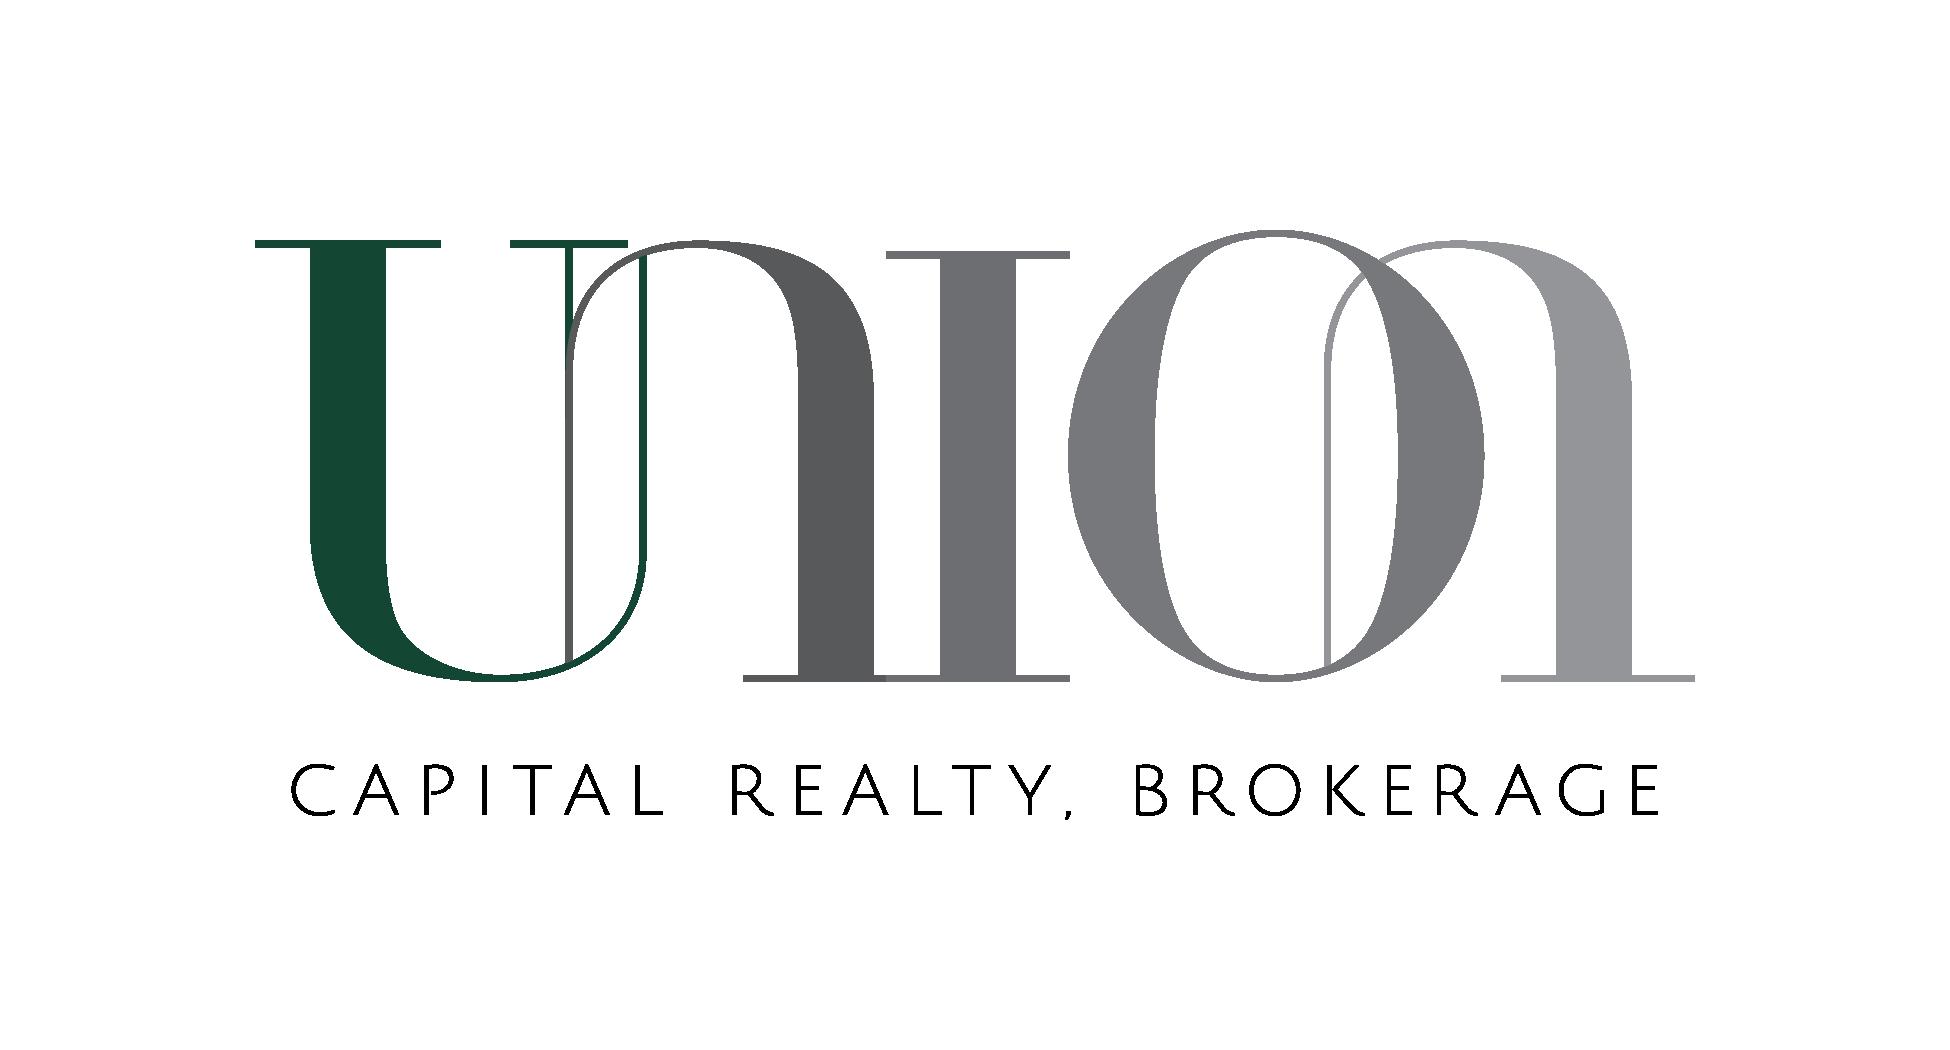 Union Capital Realty